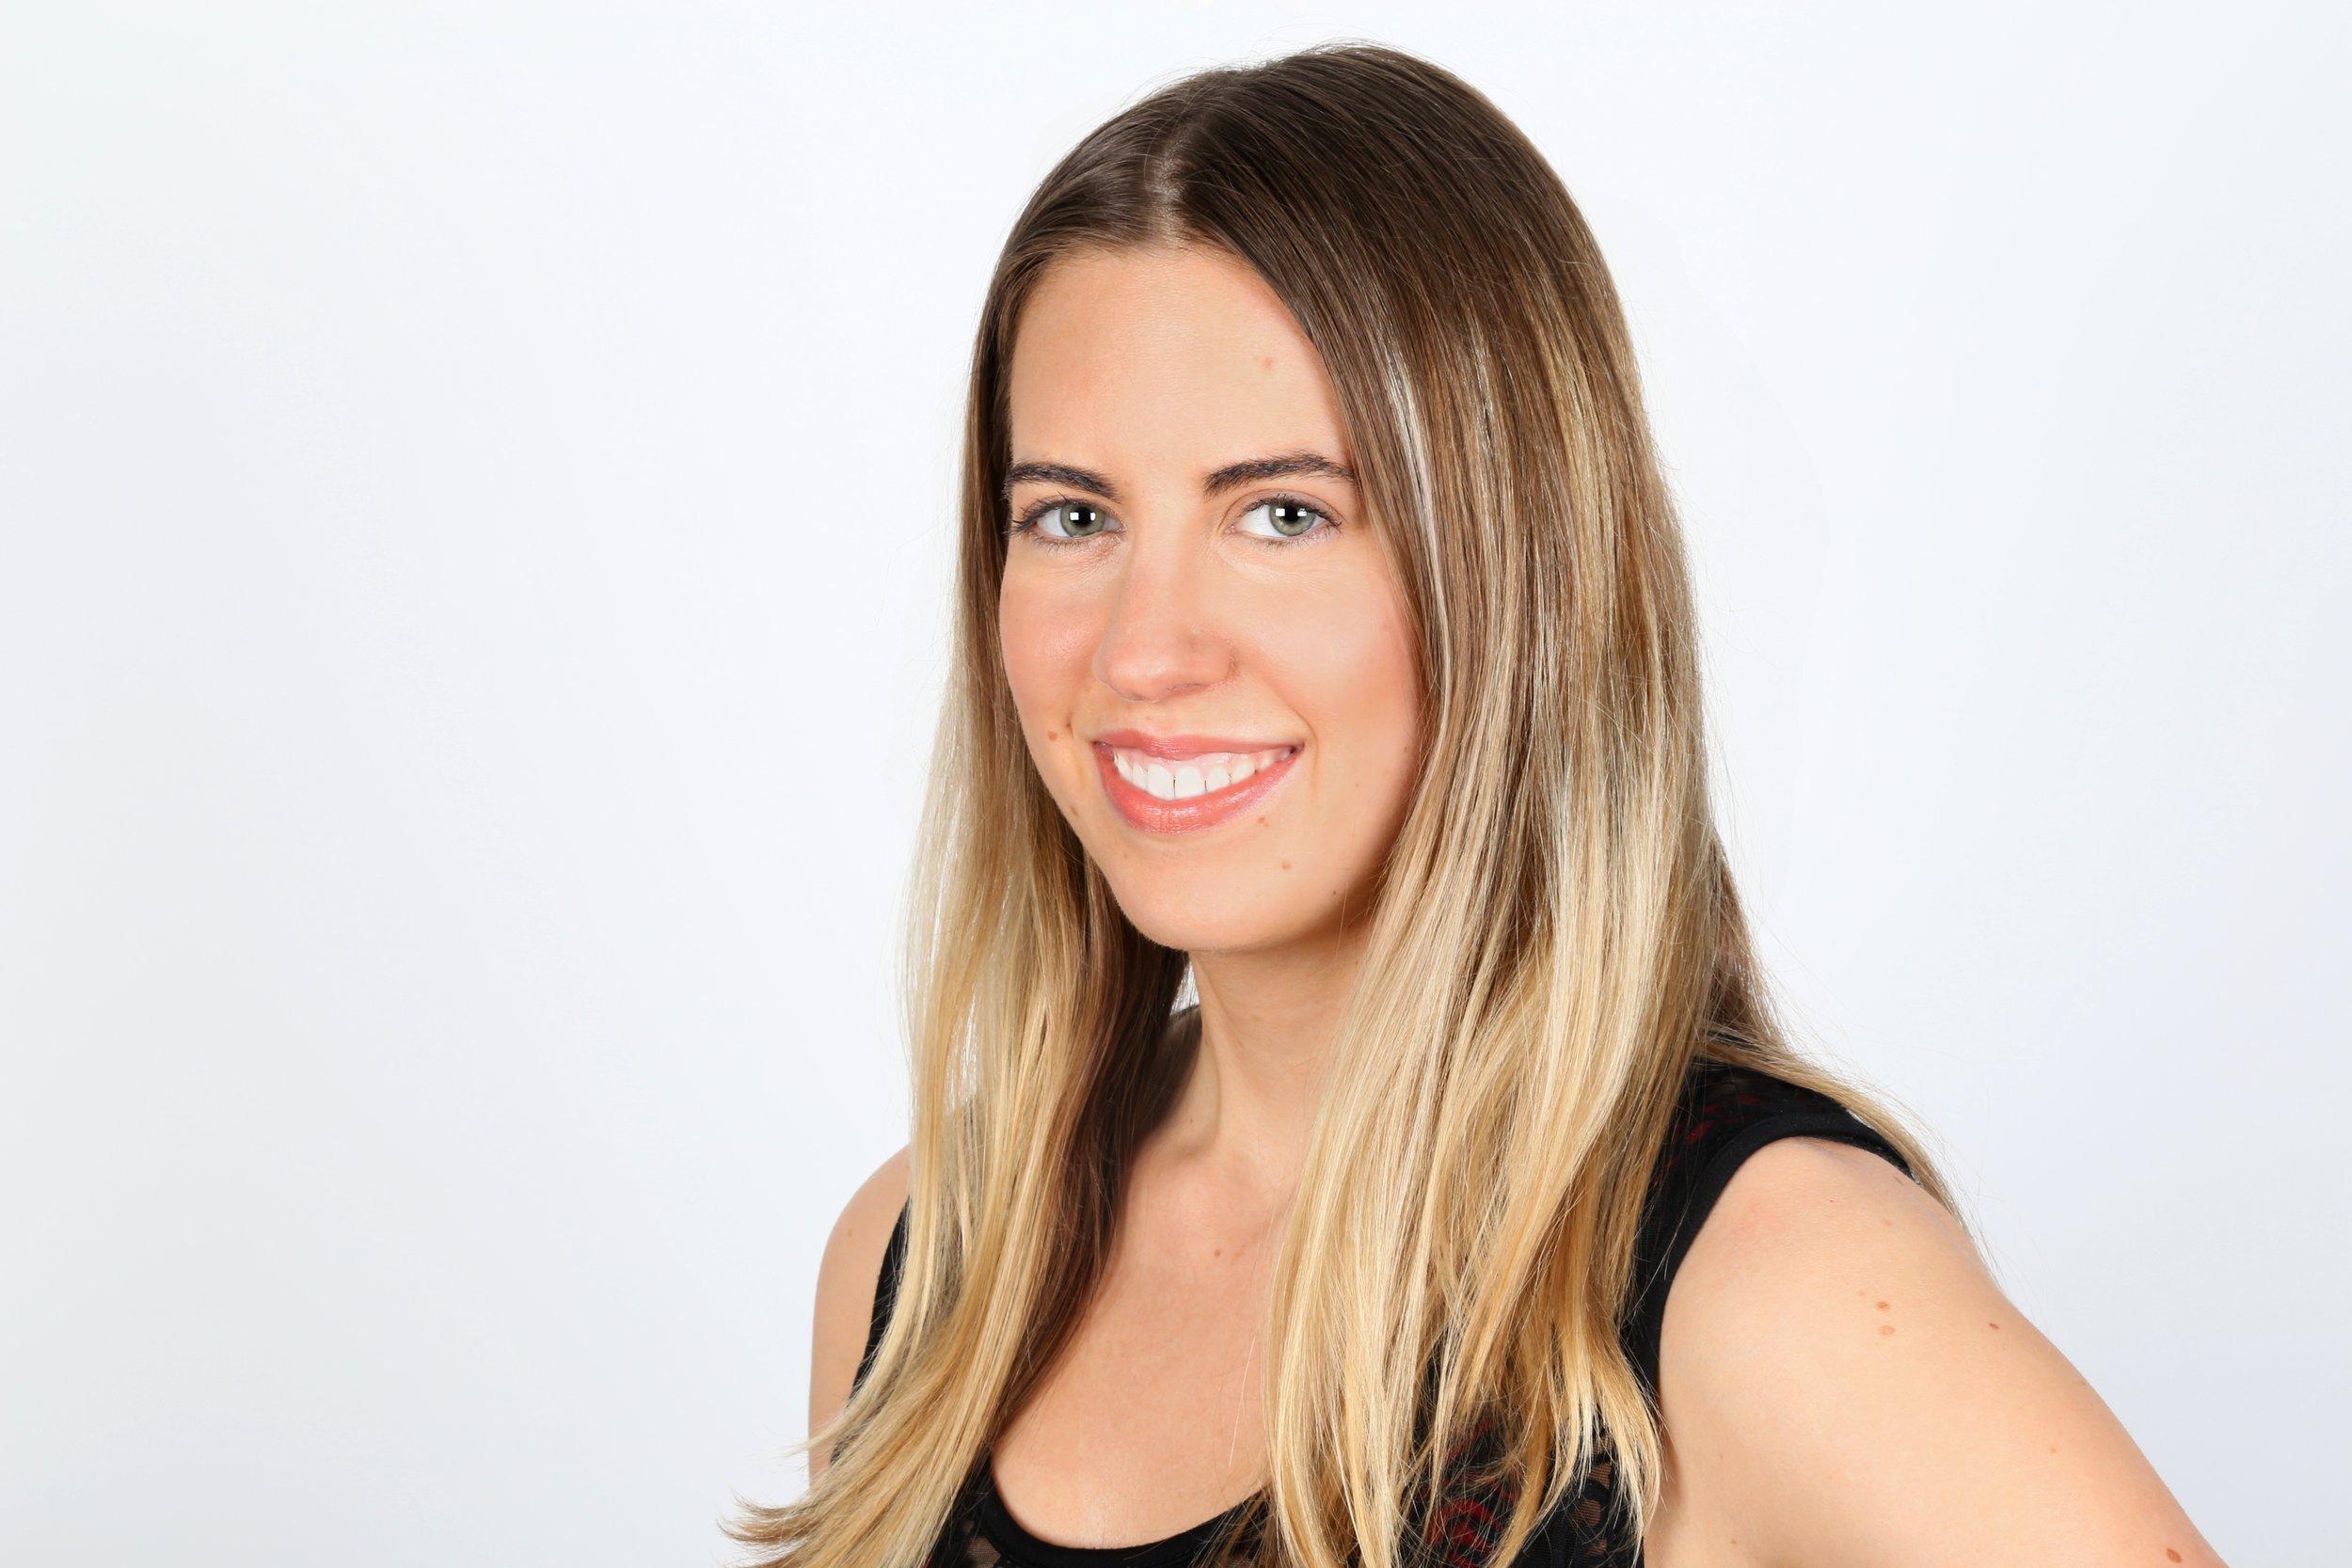 Jennifer Eenigenburg